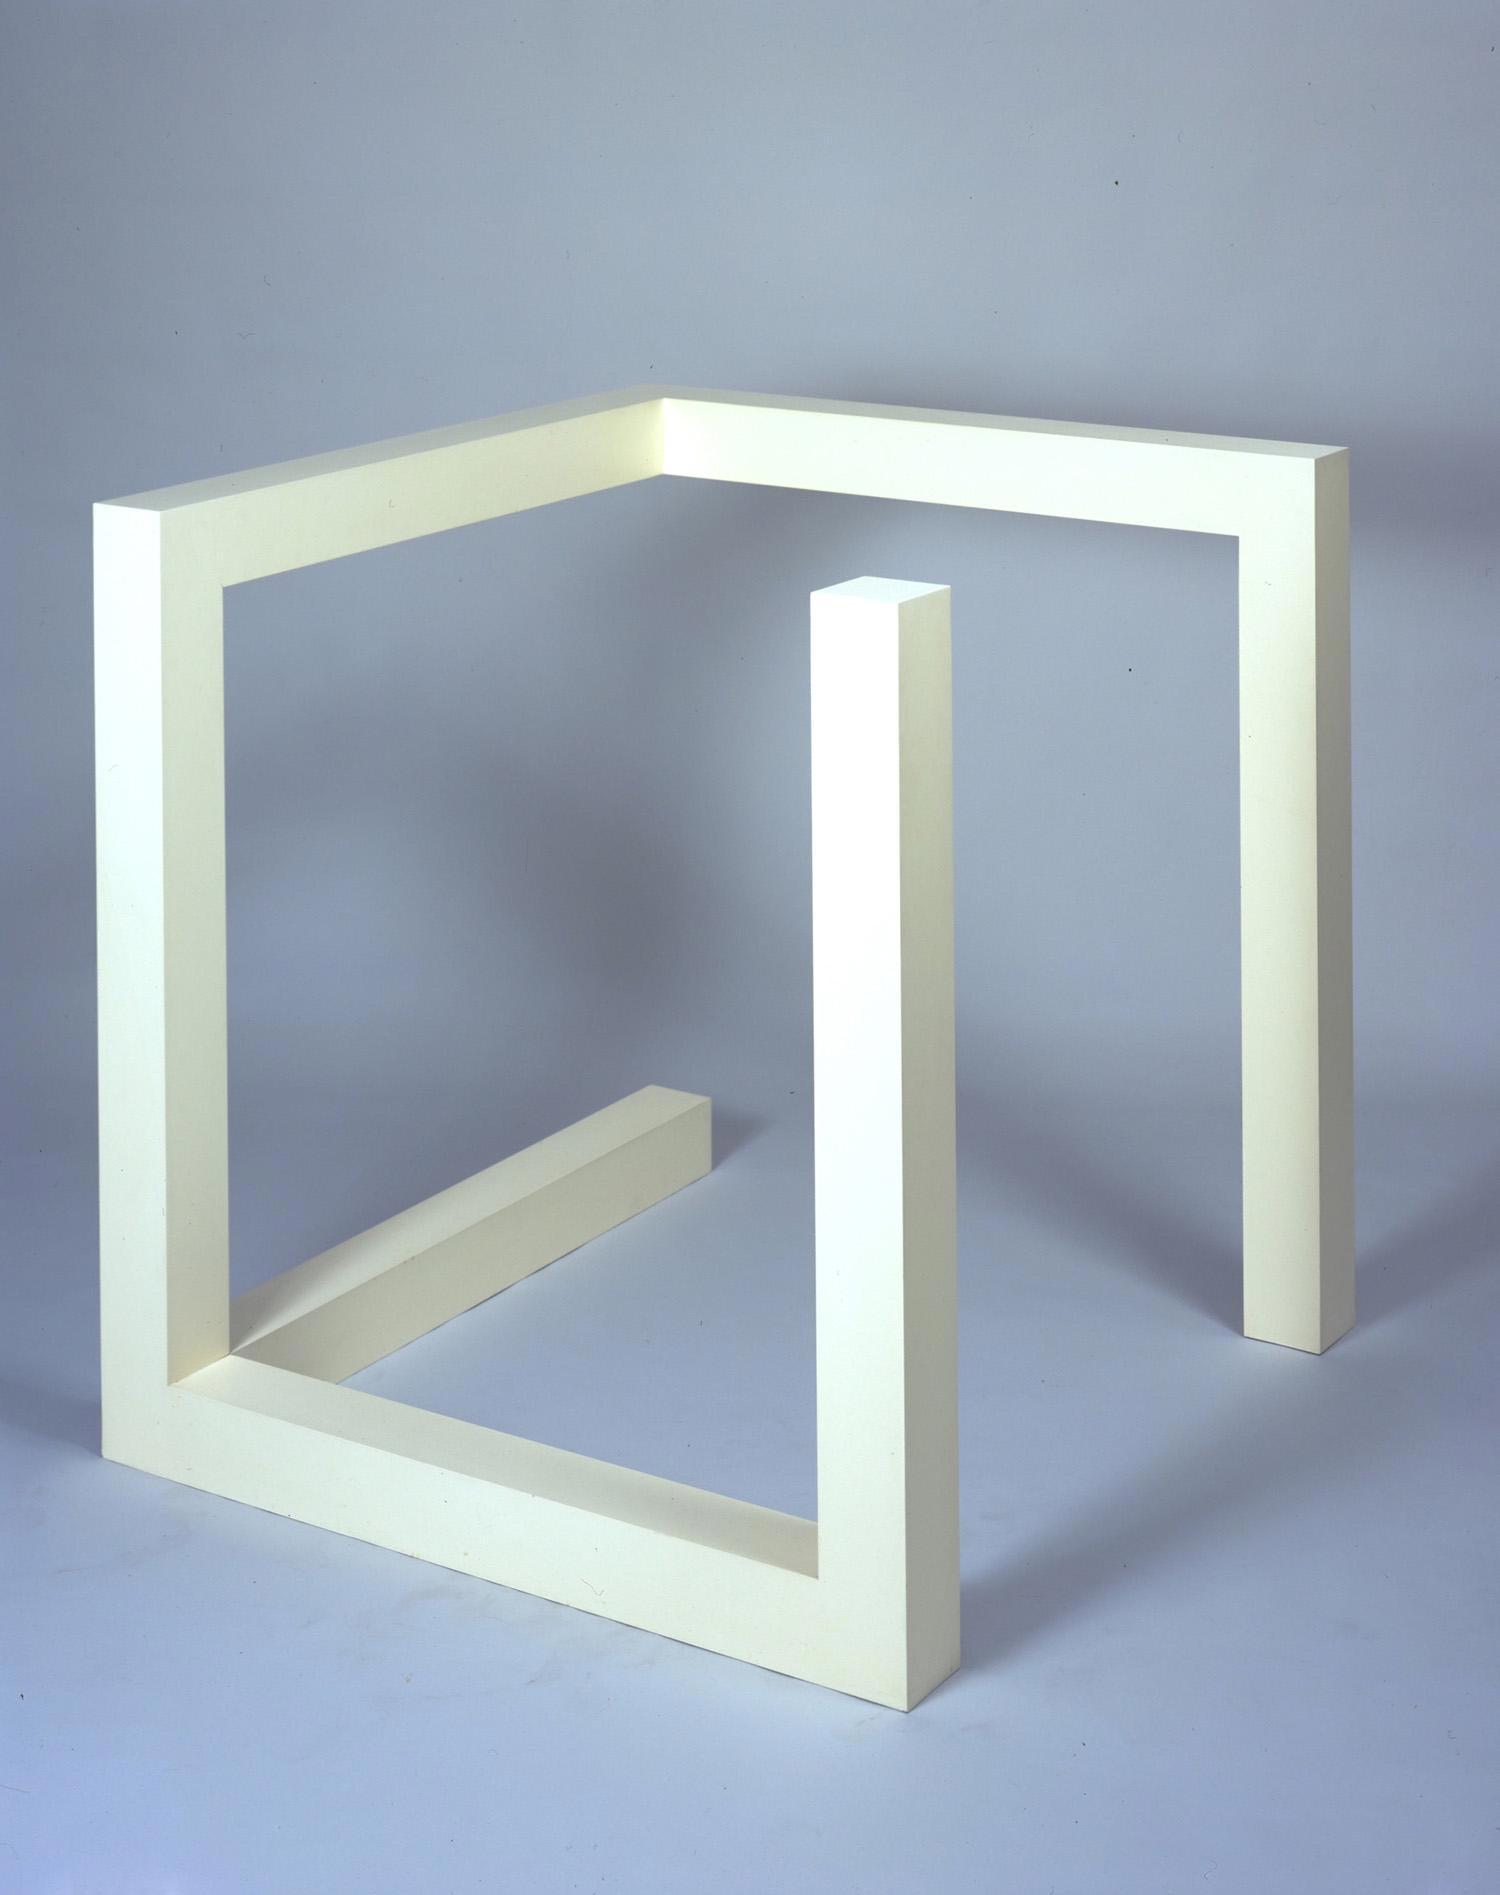 le-witt-incomplete-open-cubes-16